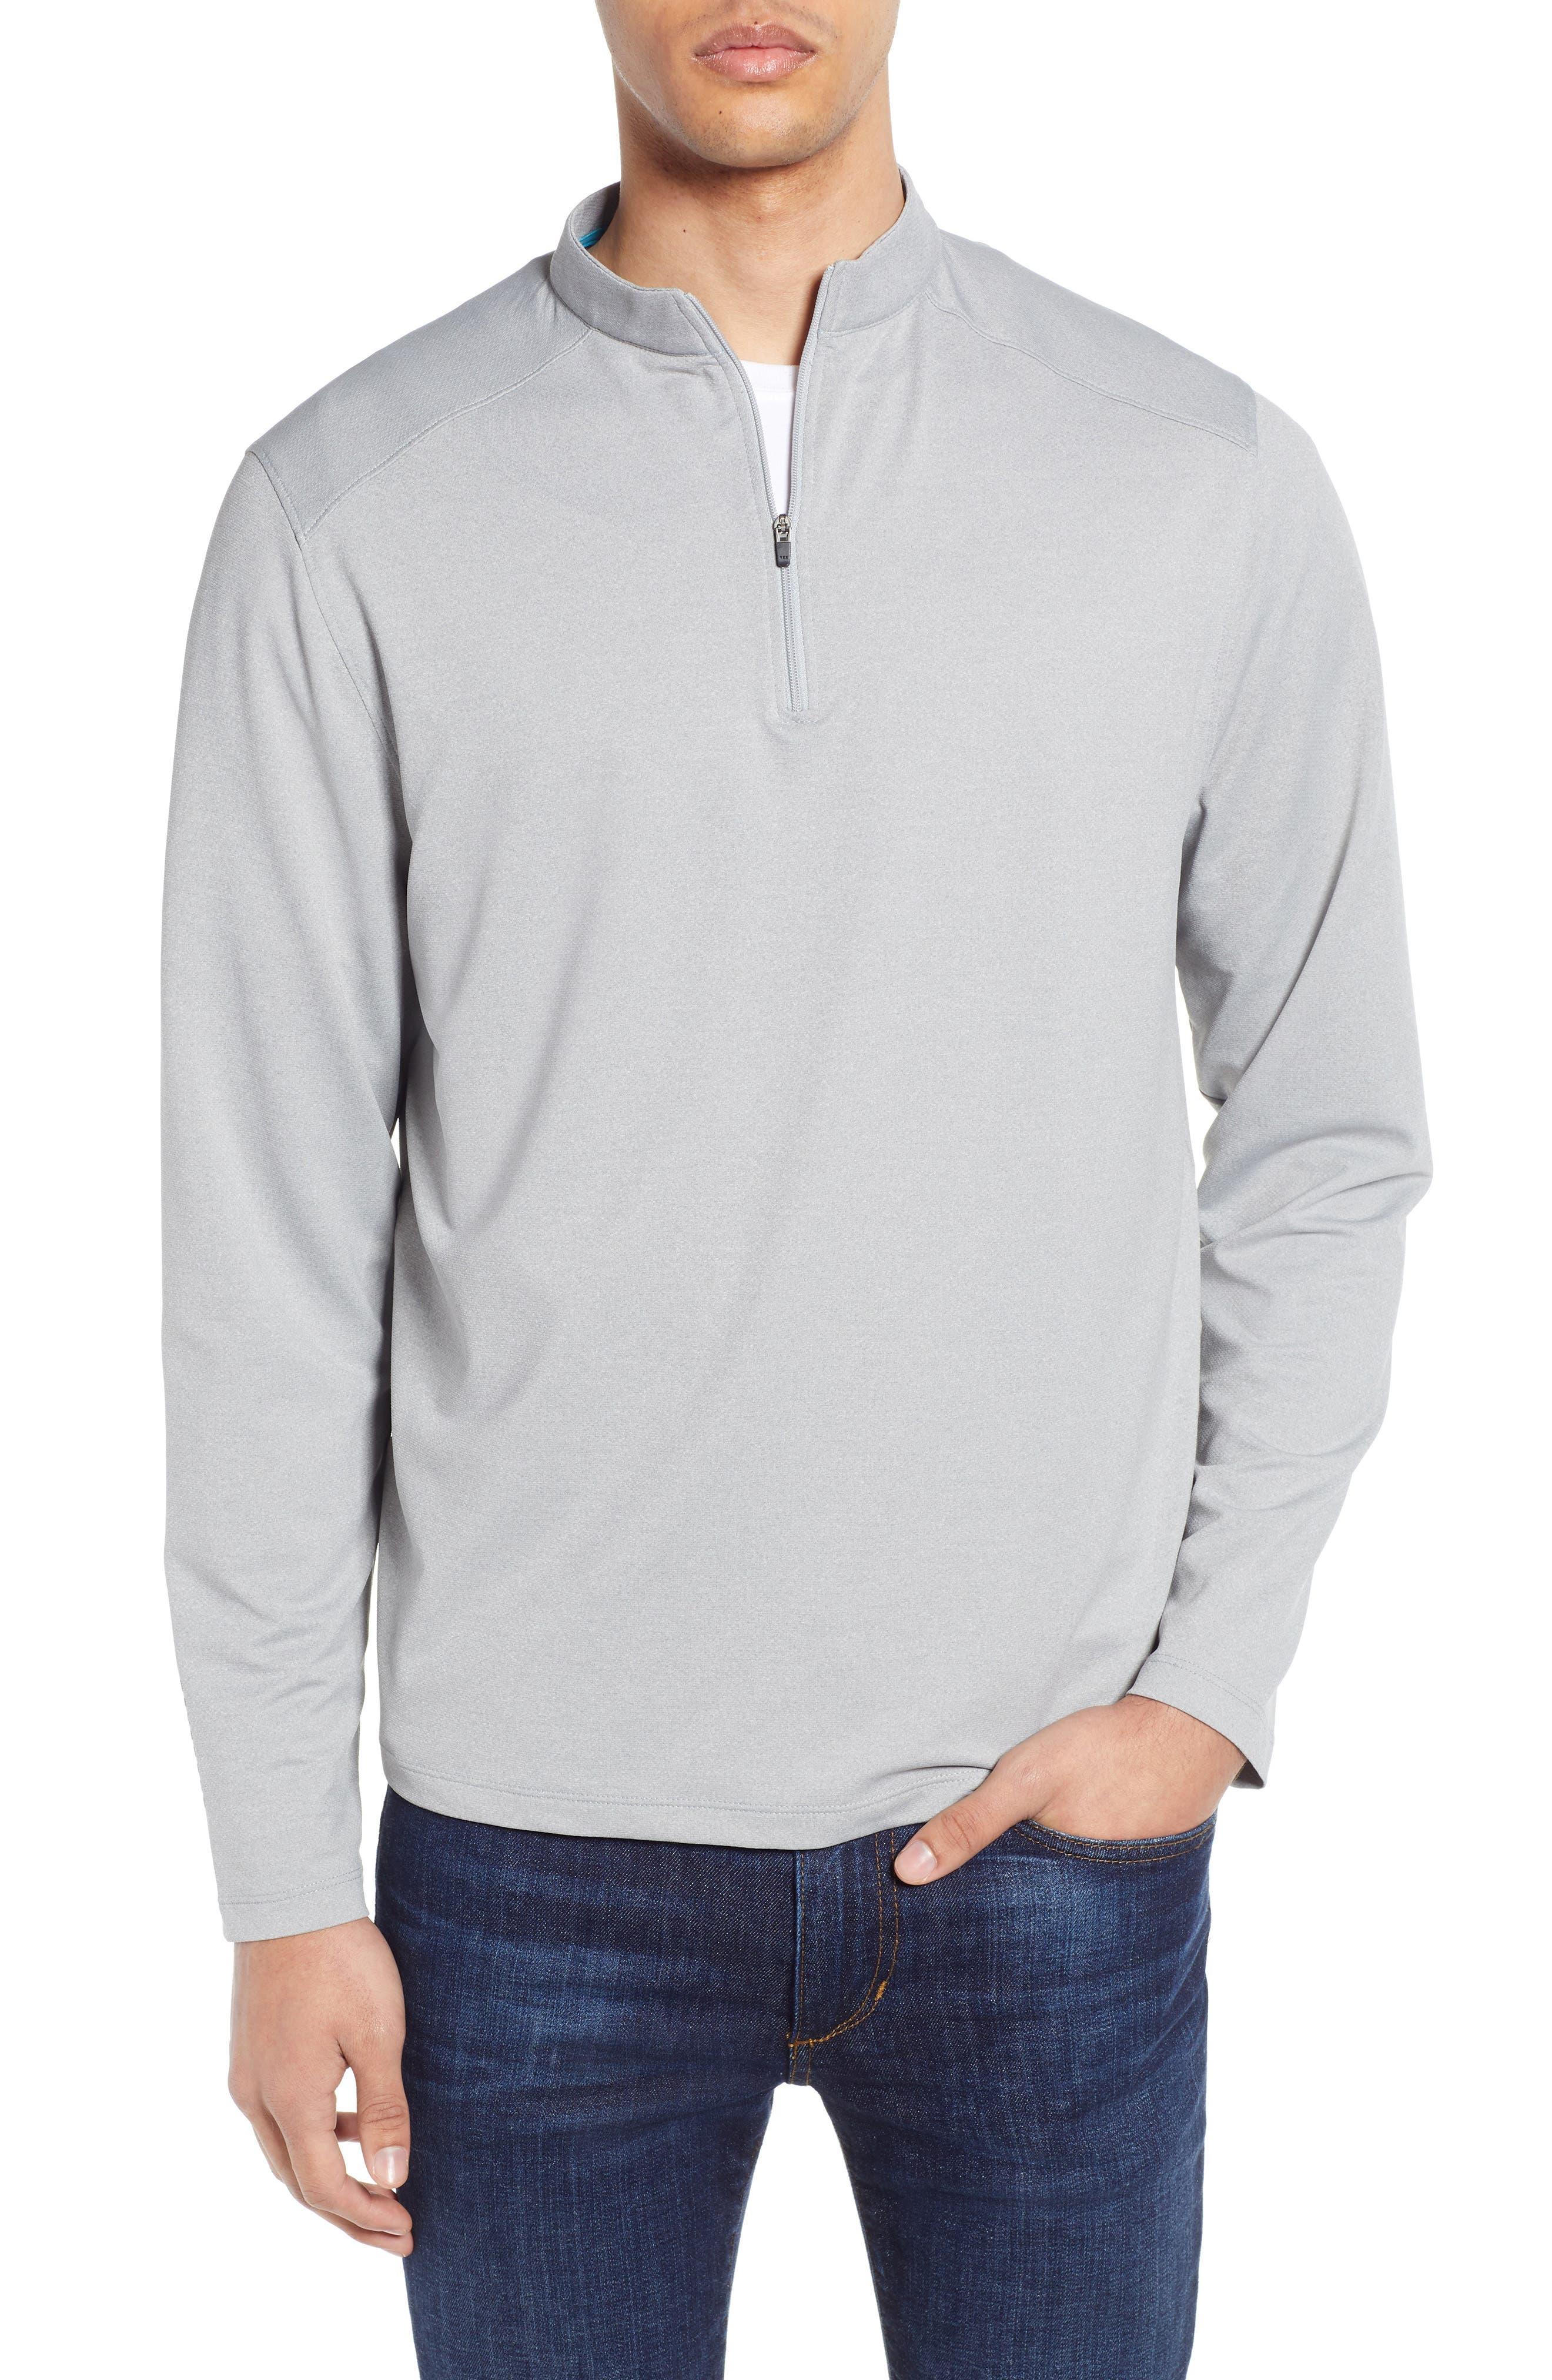 DEVEREUX Lay-Low Half Zip Pullover, Main, color, ASPHALT